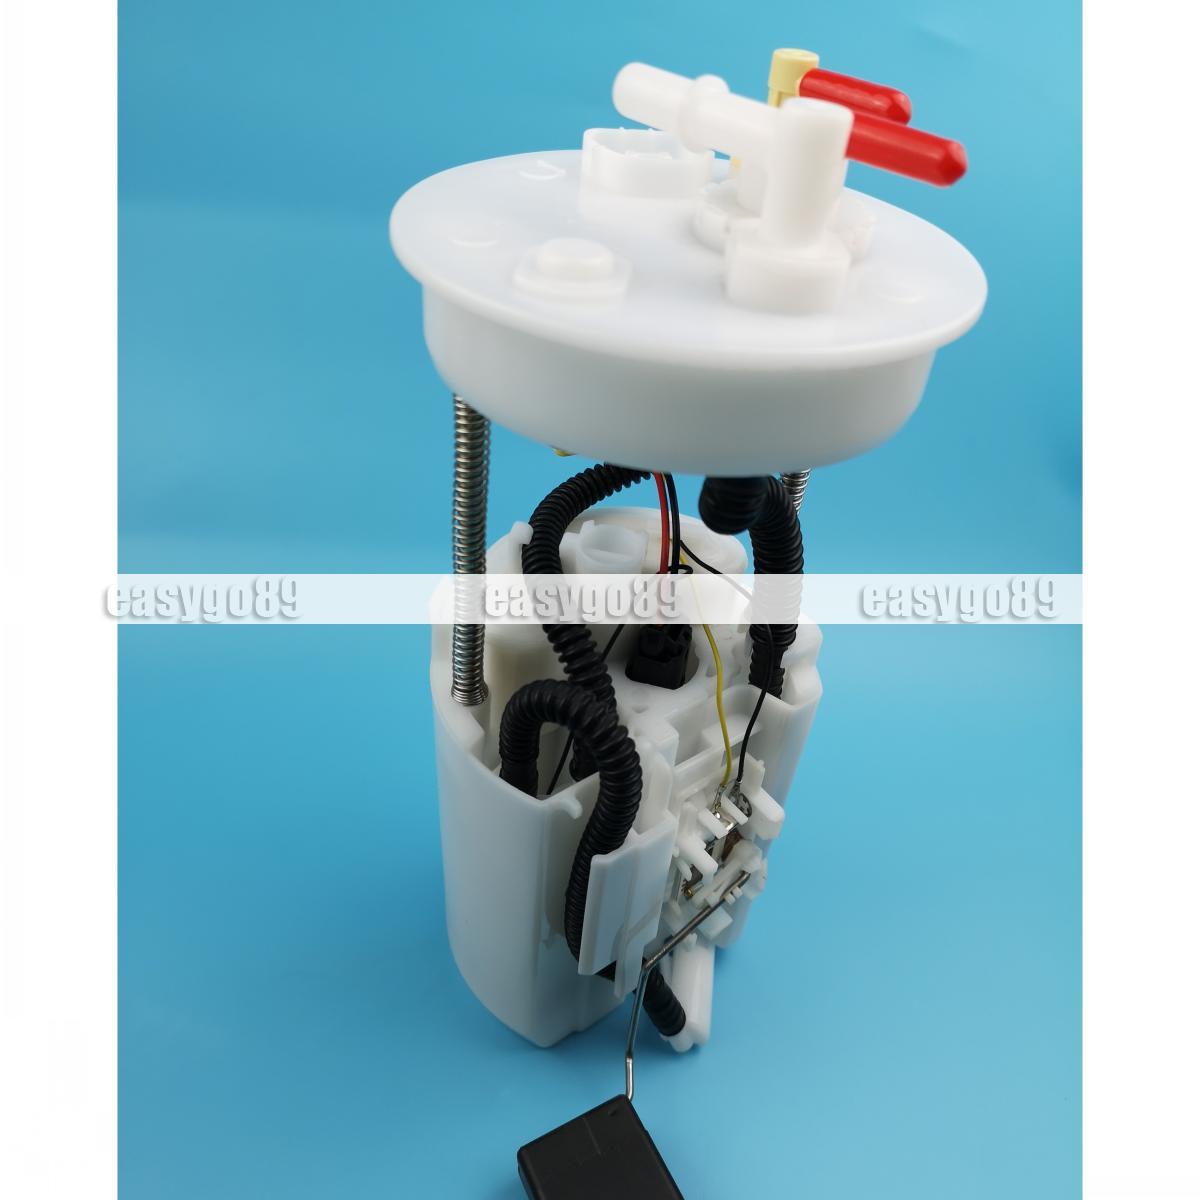 hight resolution of fuel pump assembly 17708 saa 003 fits honda jazz mk ii fit city 02 08